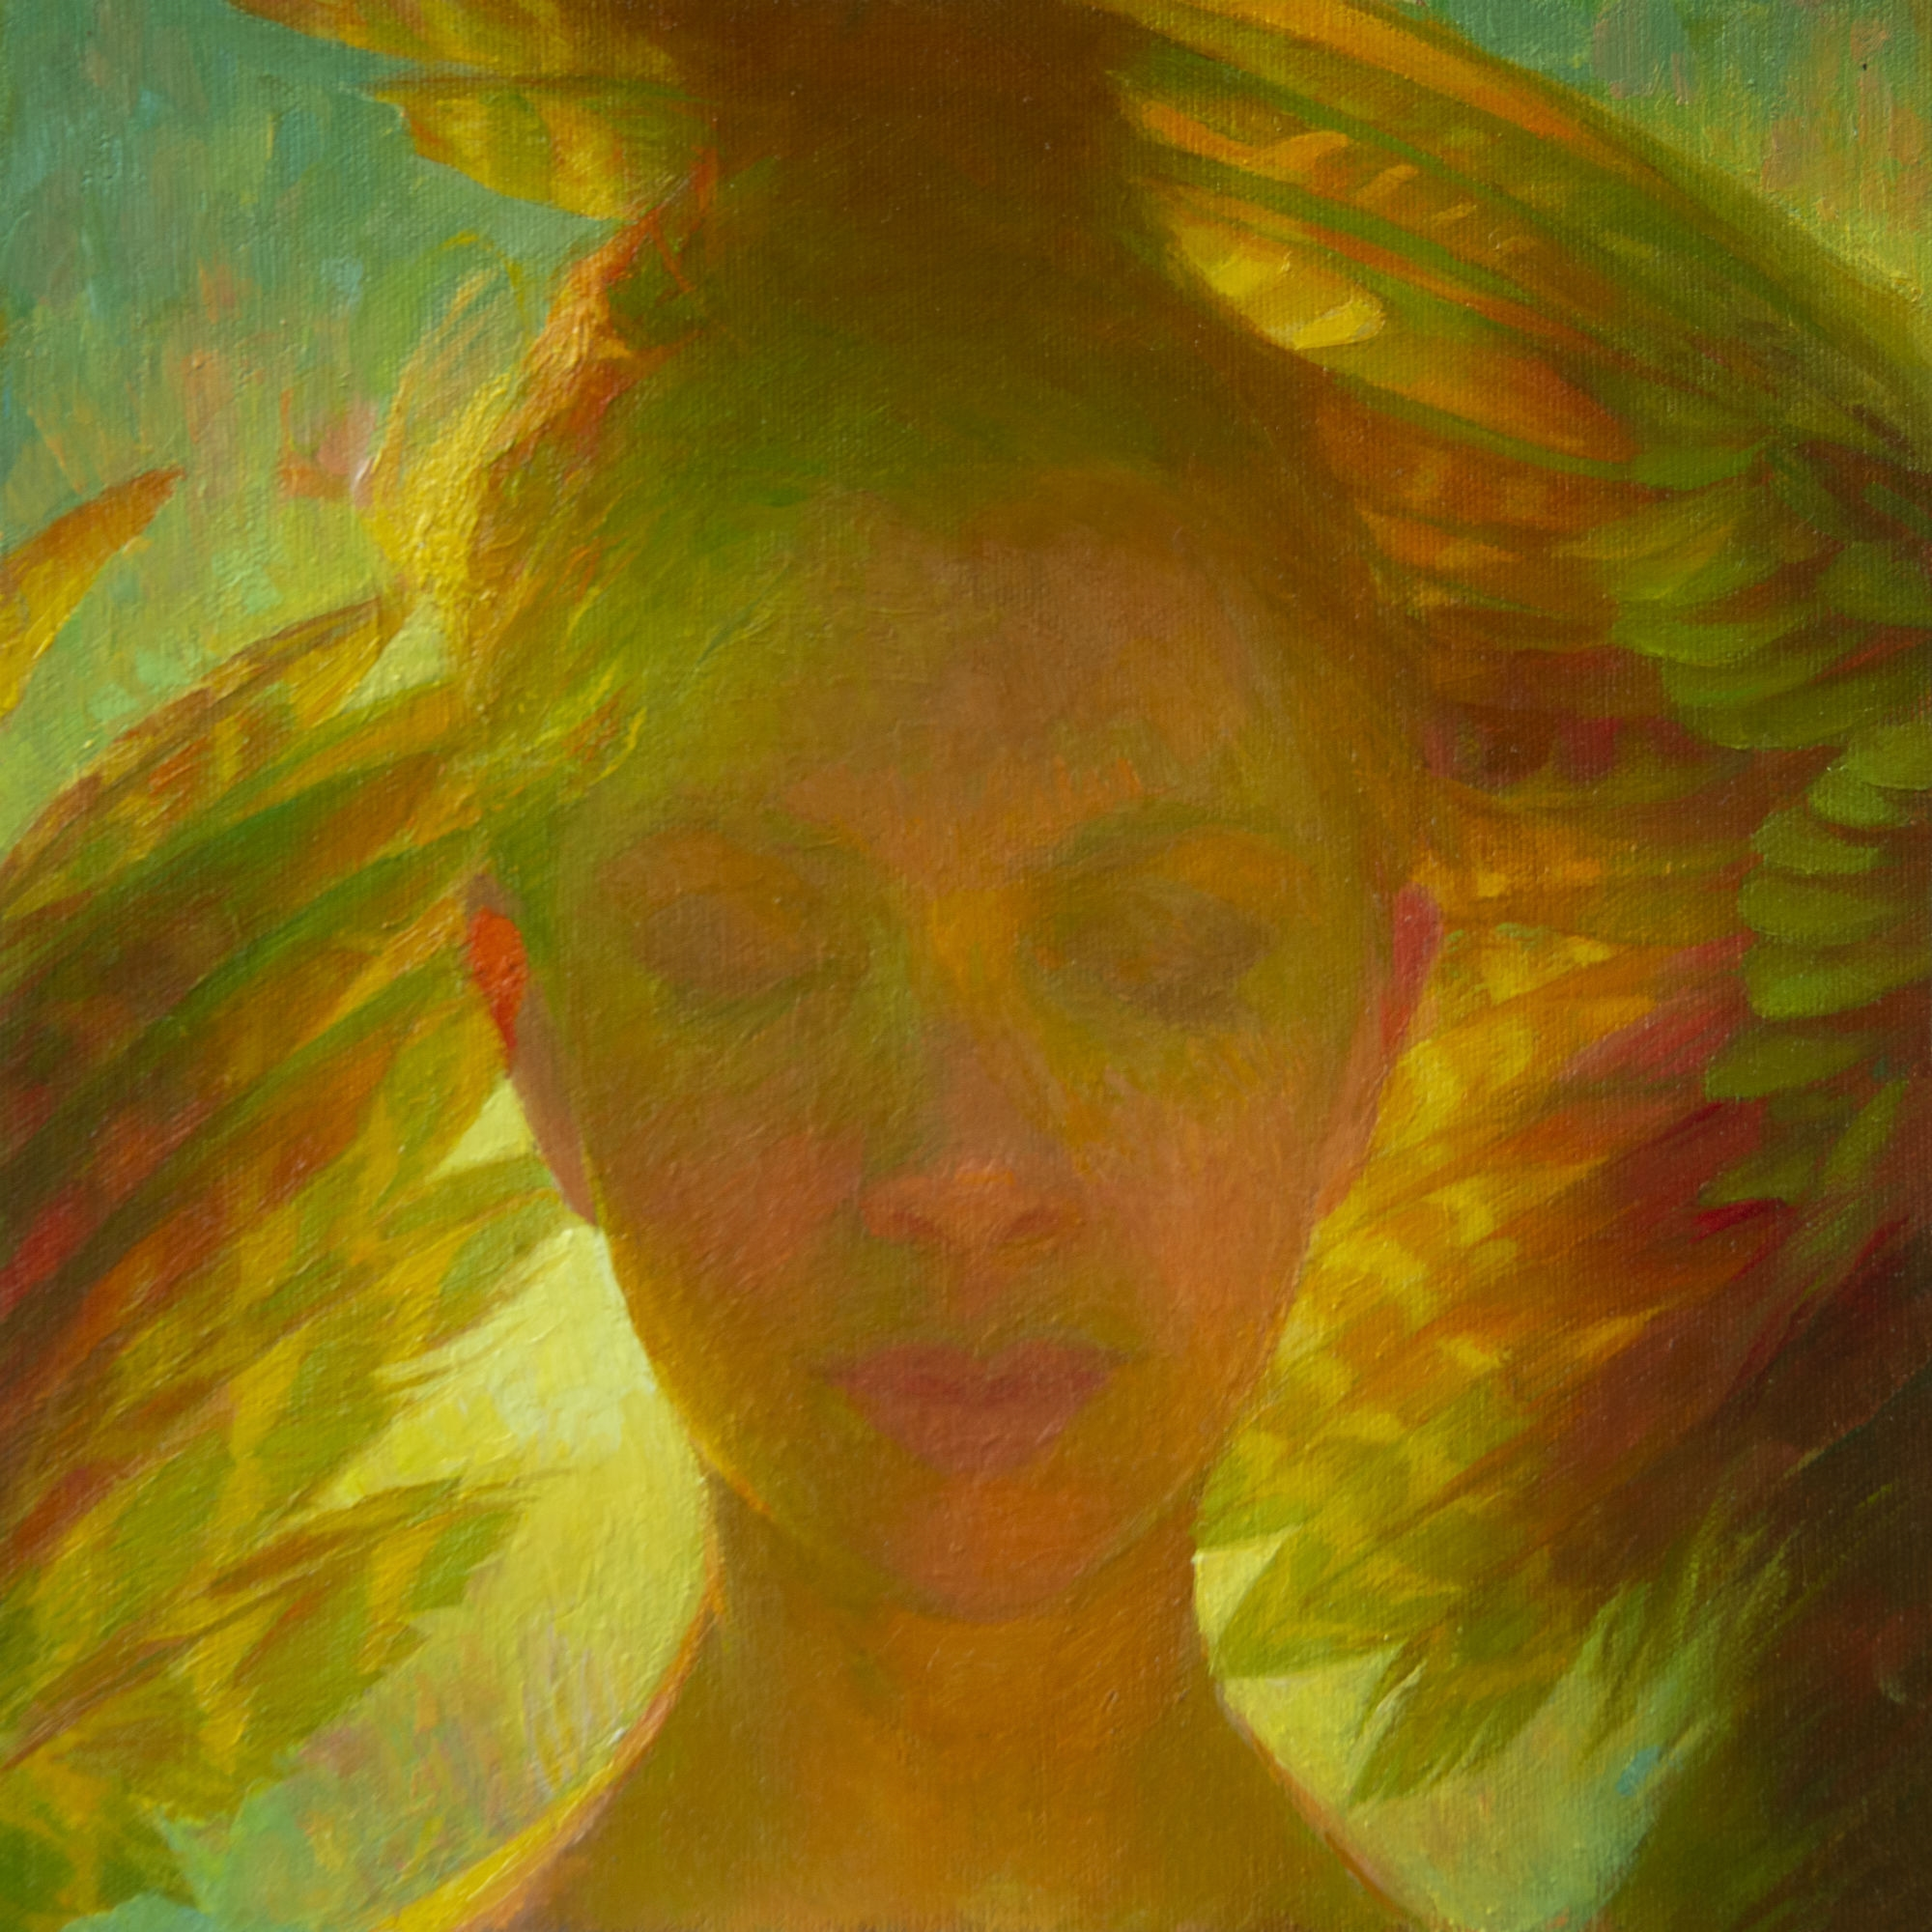 Fire I by Adrienne Stein